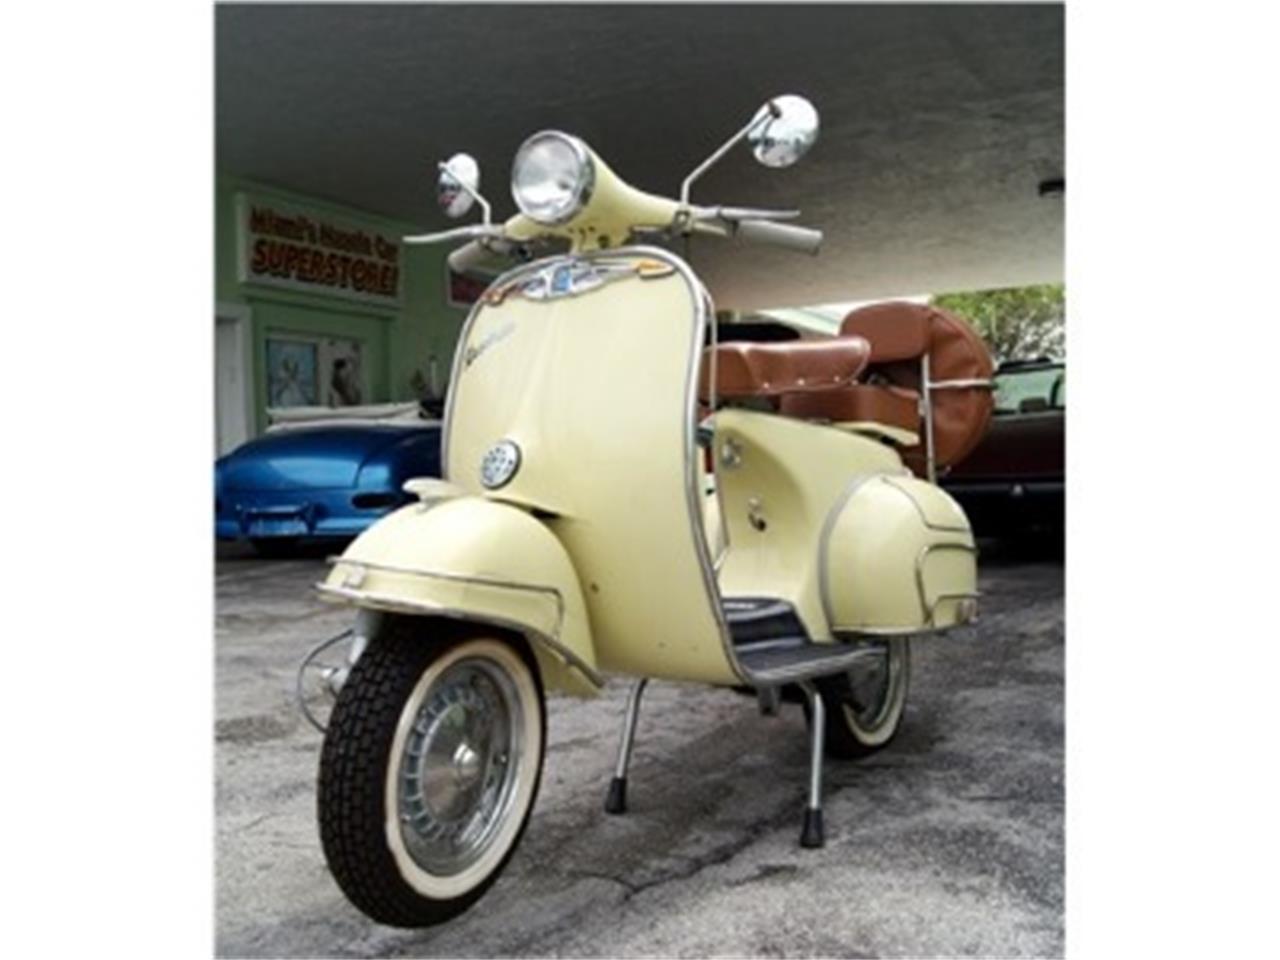 1965 Vespa Scooter For Sale Classiccars Com Cc 732902